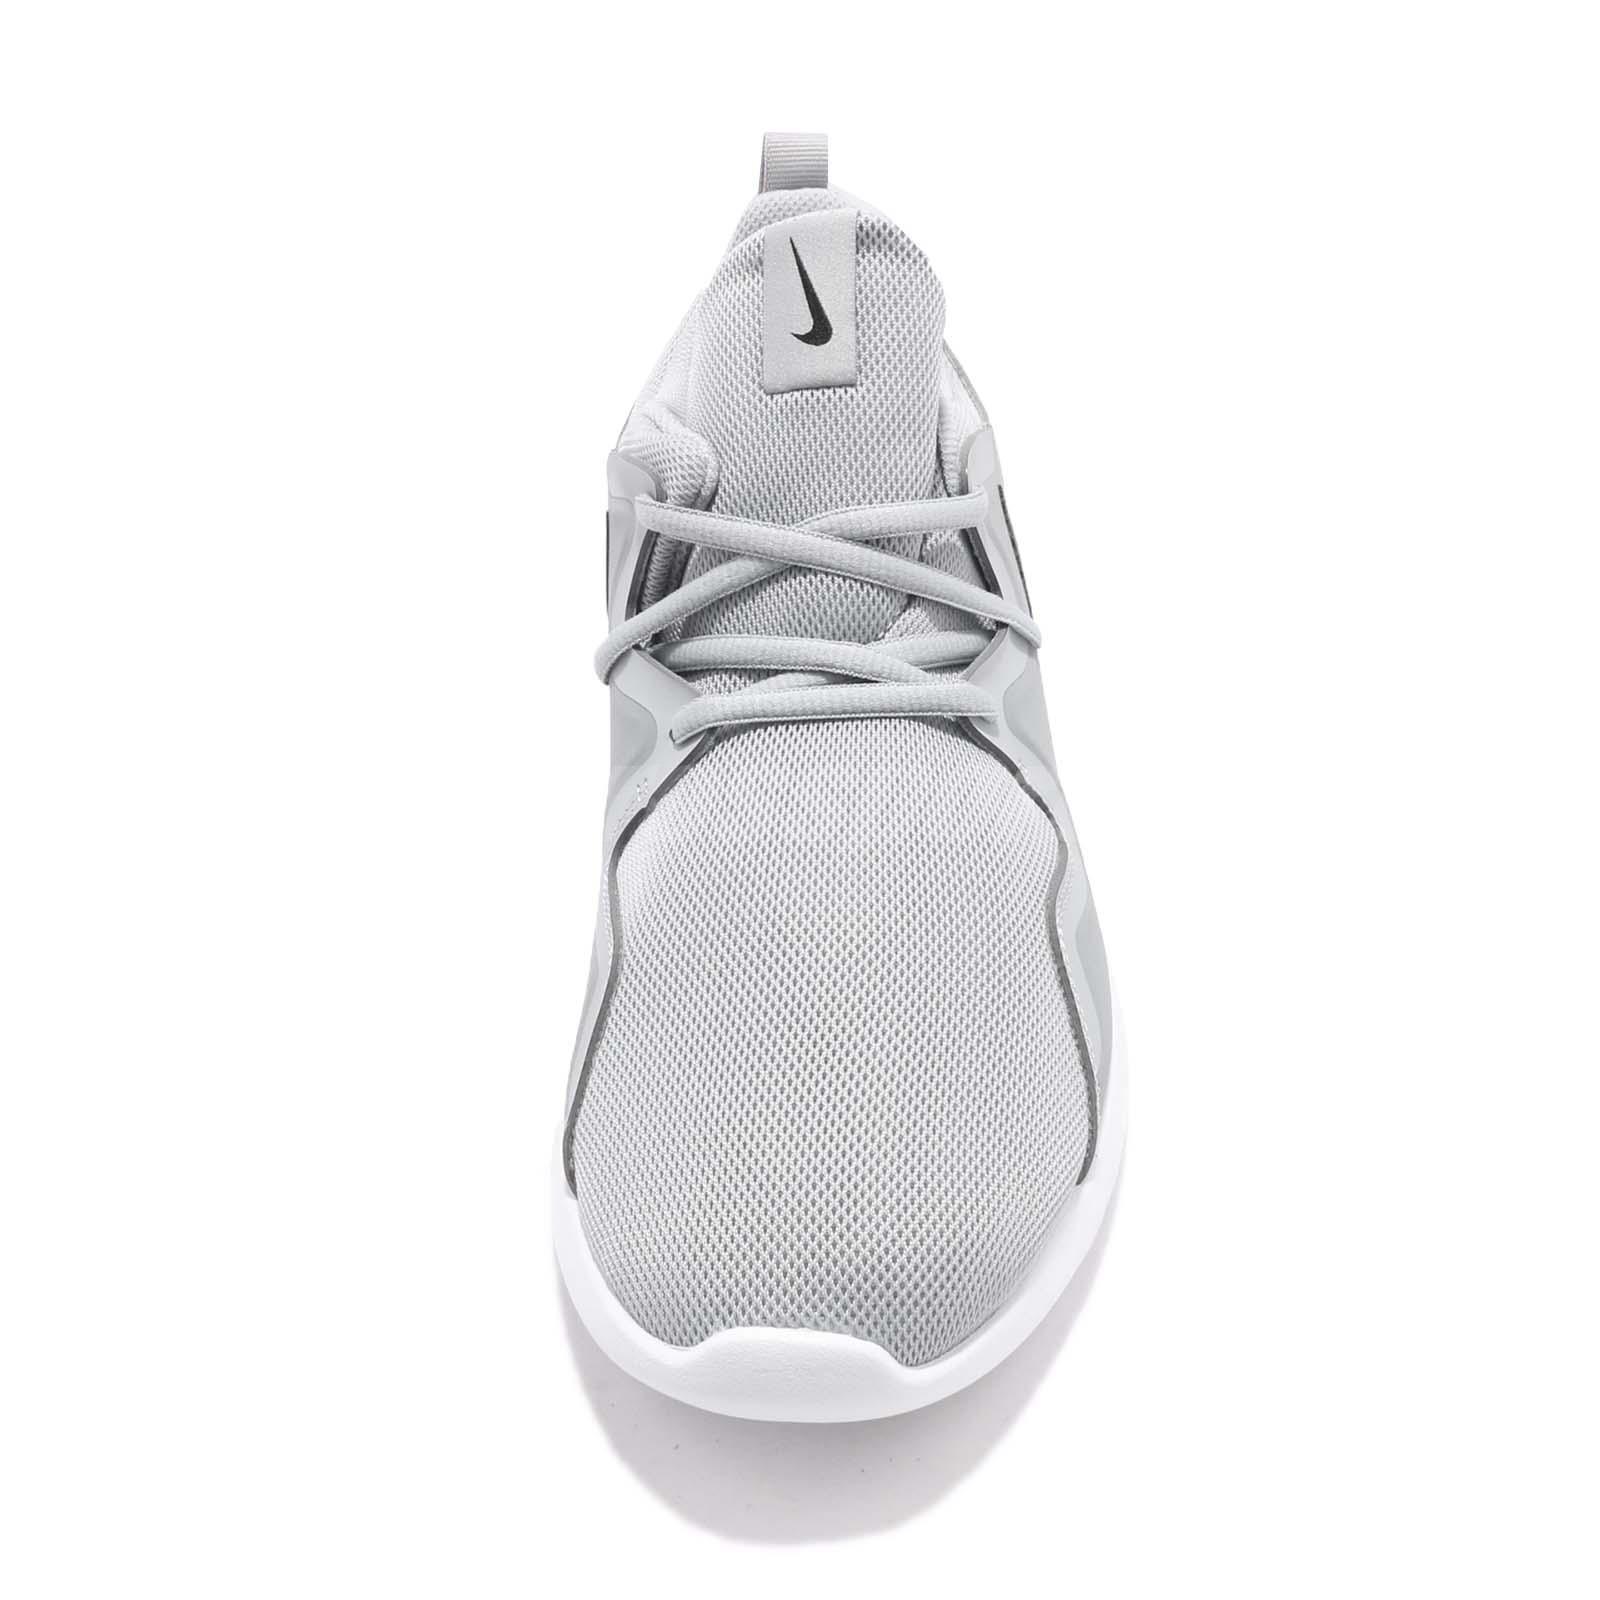 702916ddc39 Nike Tessen Wolf Grey Black White Men Athletic Shoes Sneakers ...